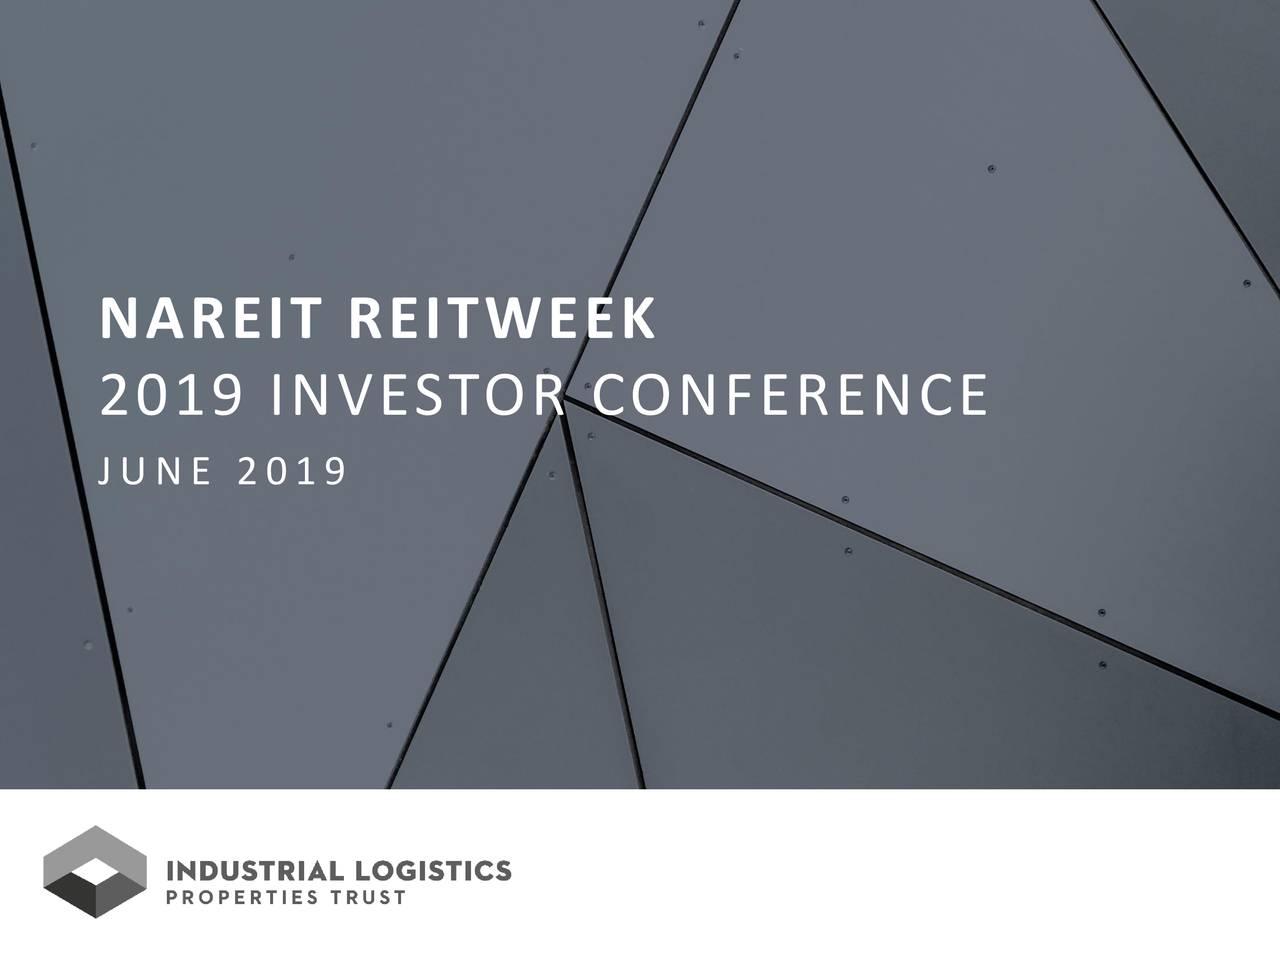 Industrial Logistics Properties Trust (ILPT) Presents At NAREIT 2019 Investor Conference - Slideshow